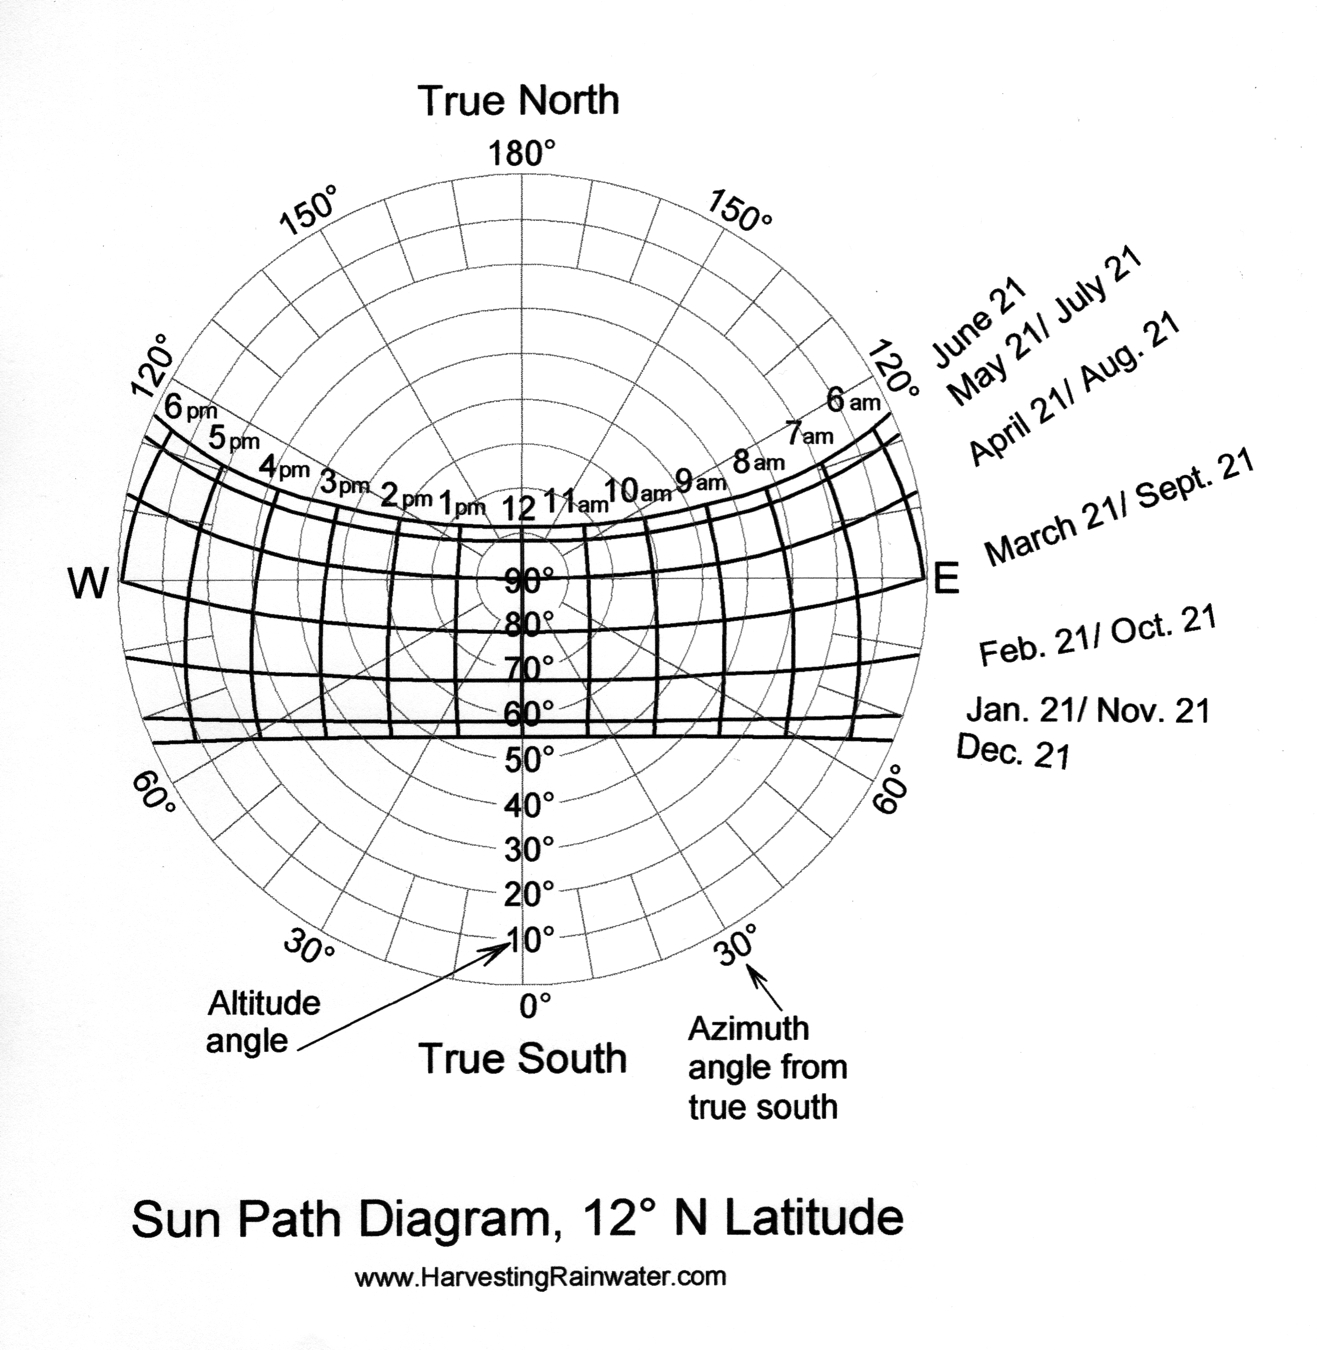 Sun Path Diagram 12o N Latitude